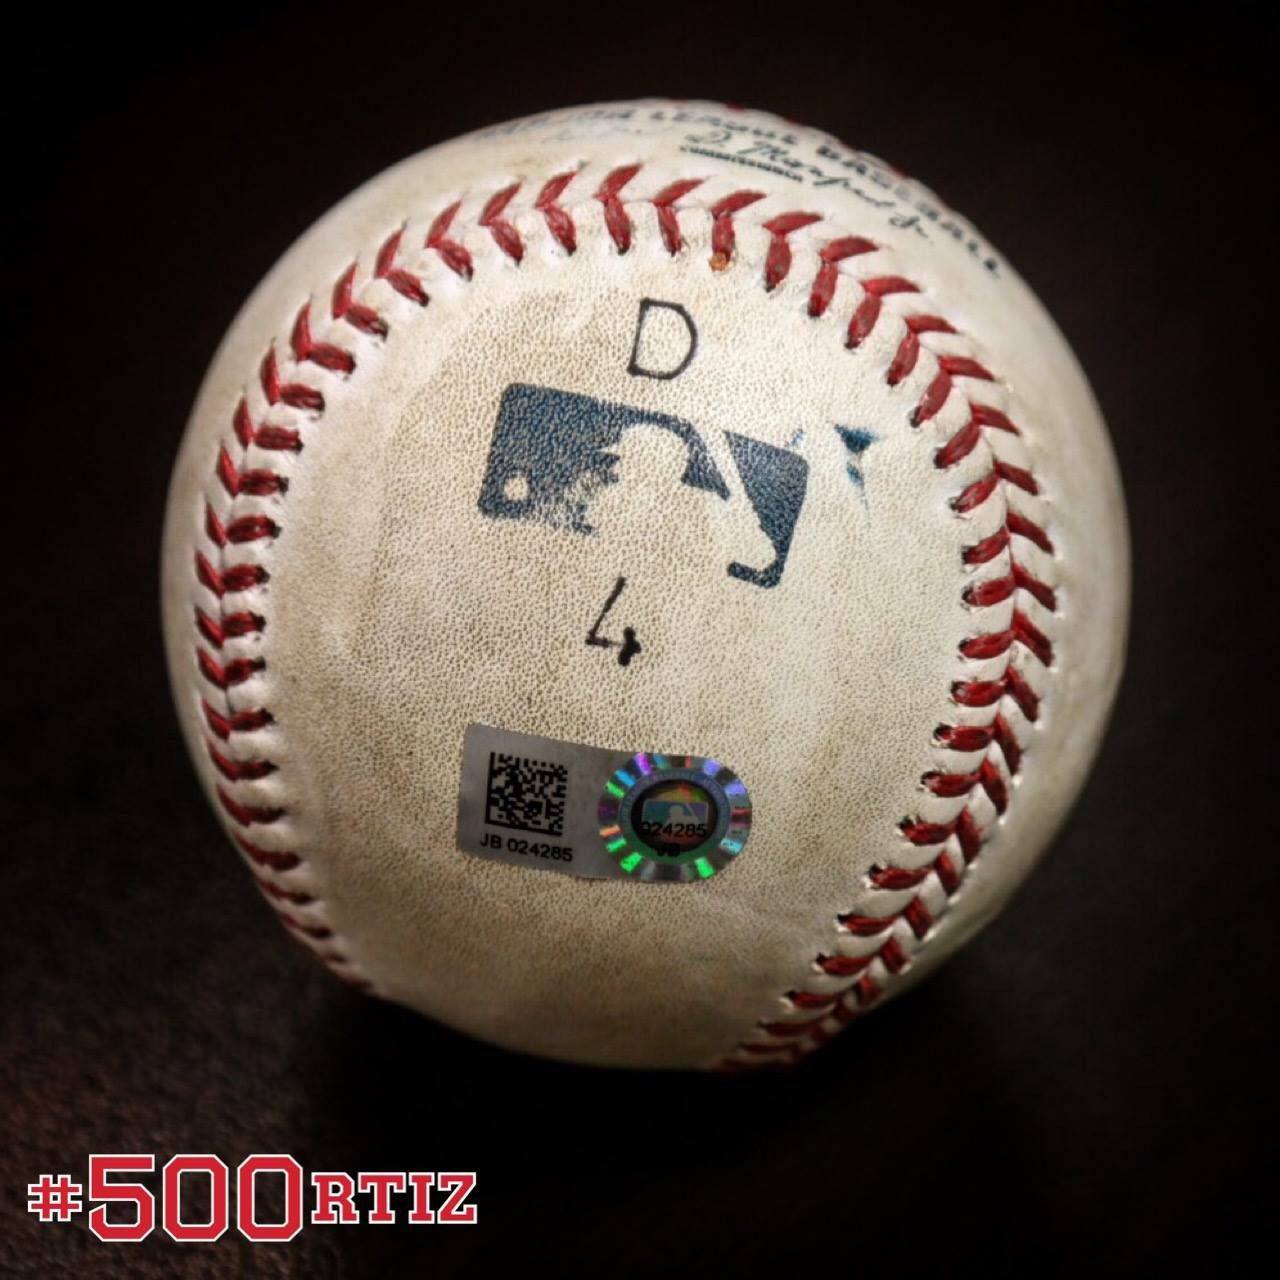 Boston Red Sox latest Mr. 500